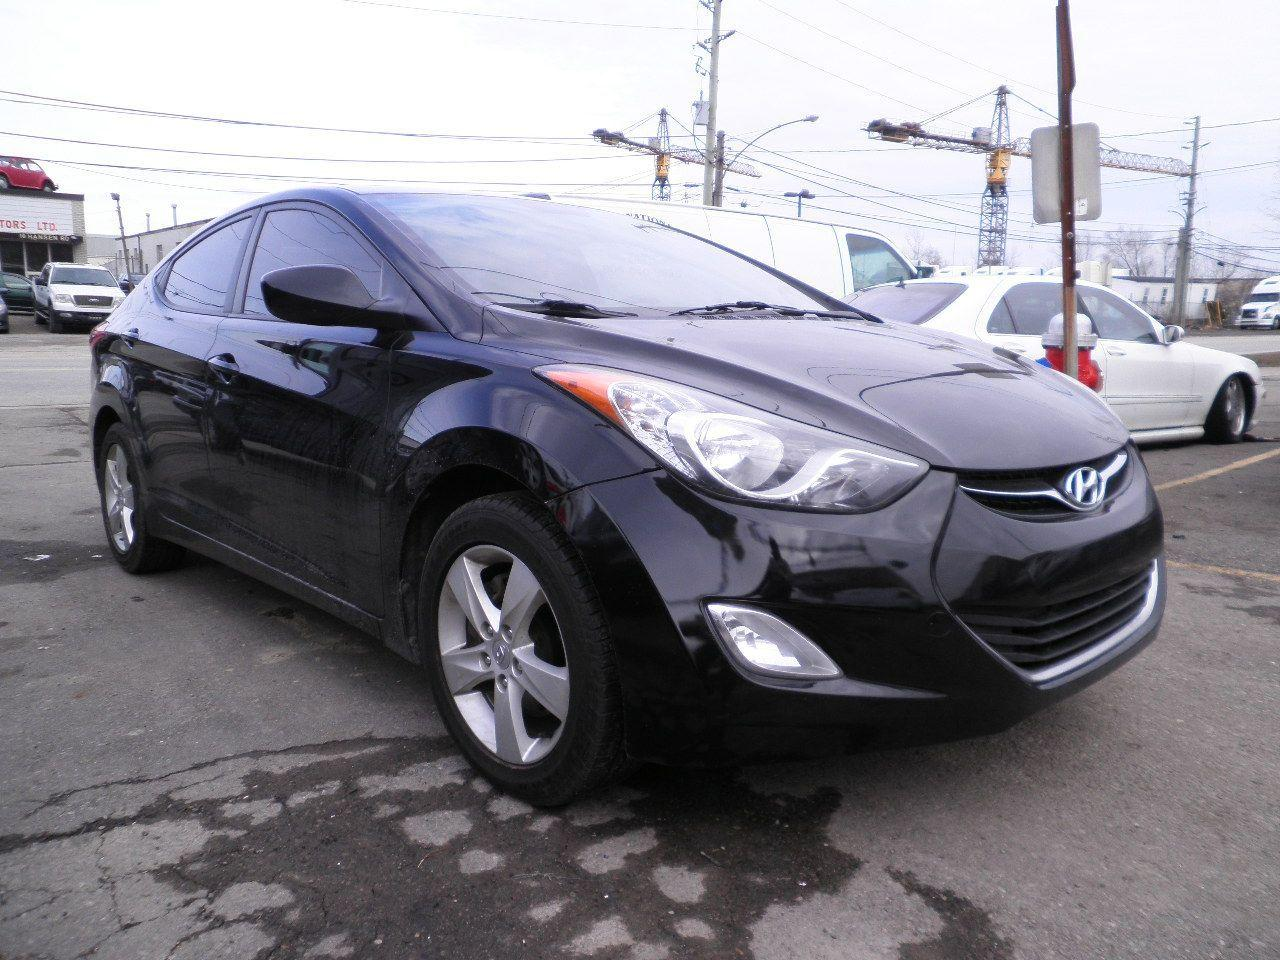 Photo of Black 2011 Hyundai Elantra